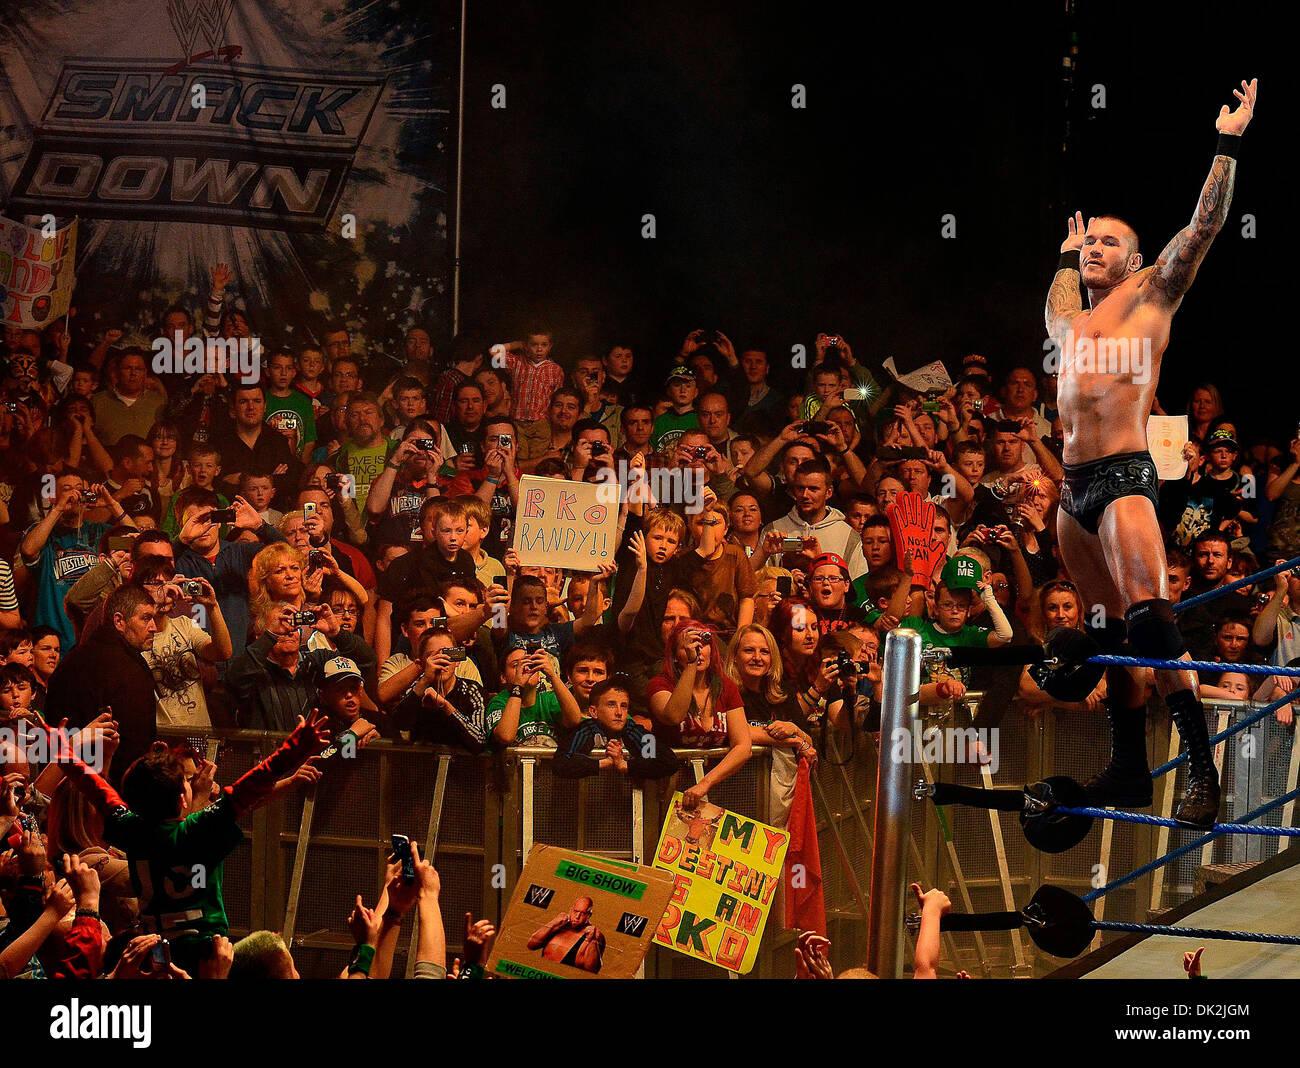 Randy Orton WWE Smack Down at the O2 Arena Dublin, Ireland - 12.04.12. Stock Photo